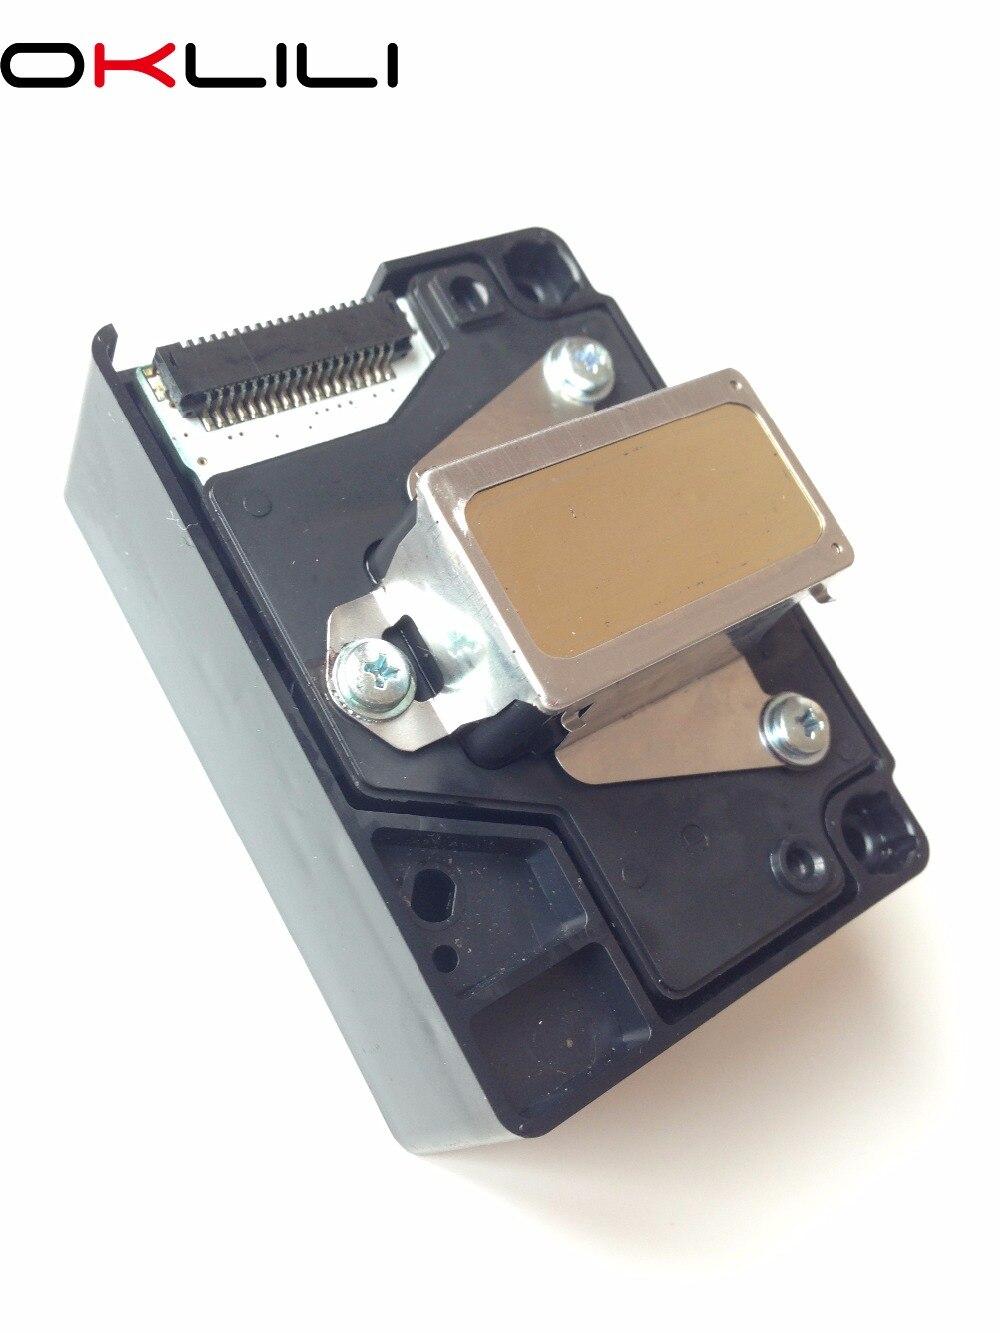 F185000 Druckkopf Druckkopf für Epson ME1100 ME70 ME650 C110 C120 C10 C1100 T30 T33 T110 T1100 T1110 SC110 TX510 B1100 L1300